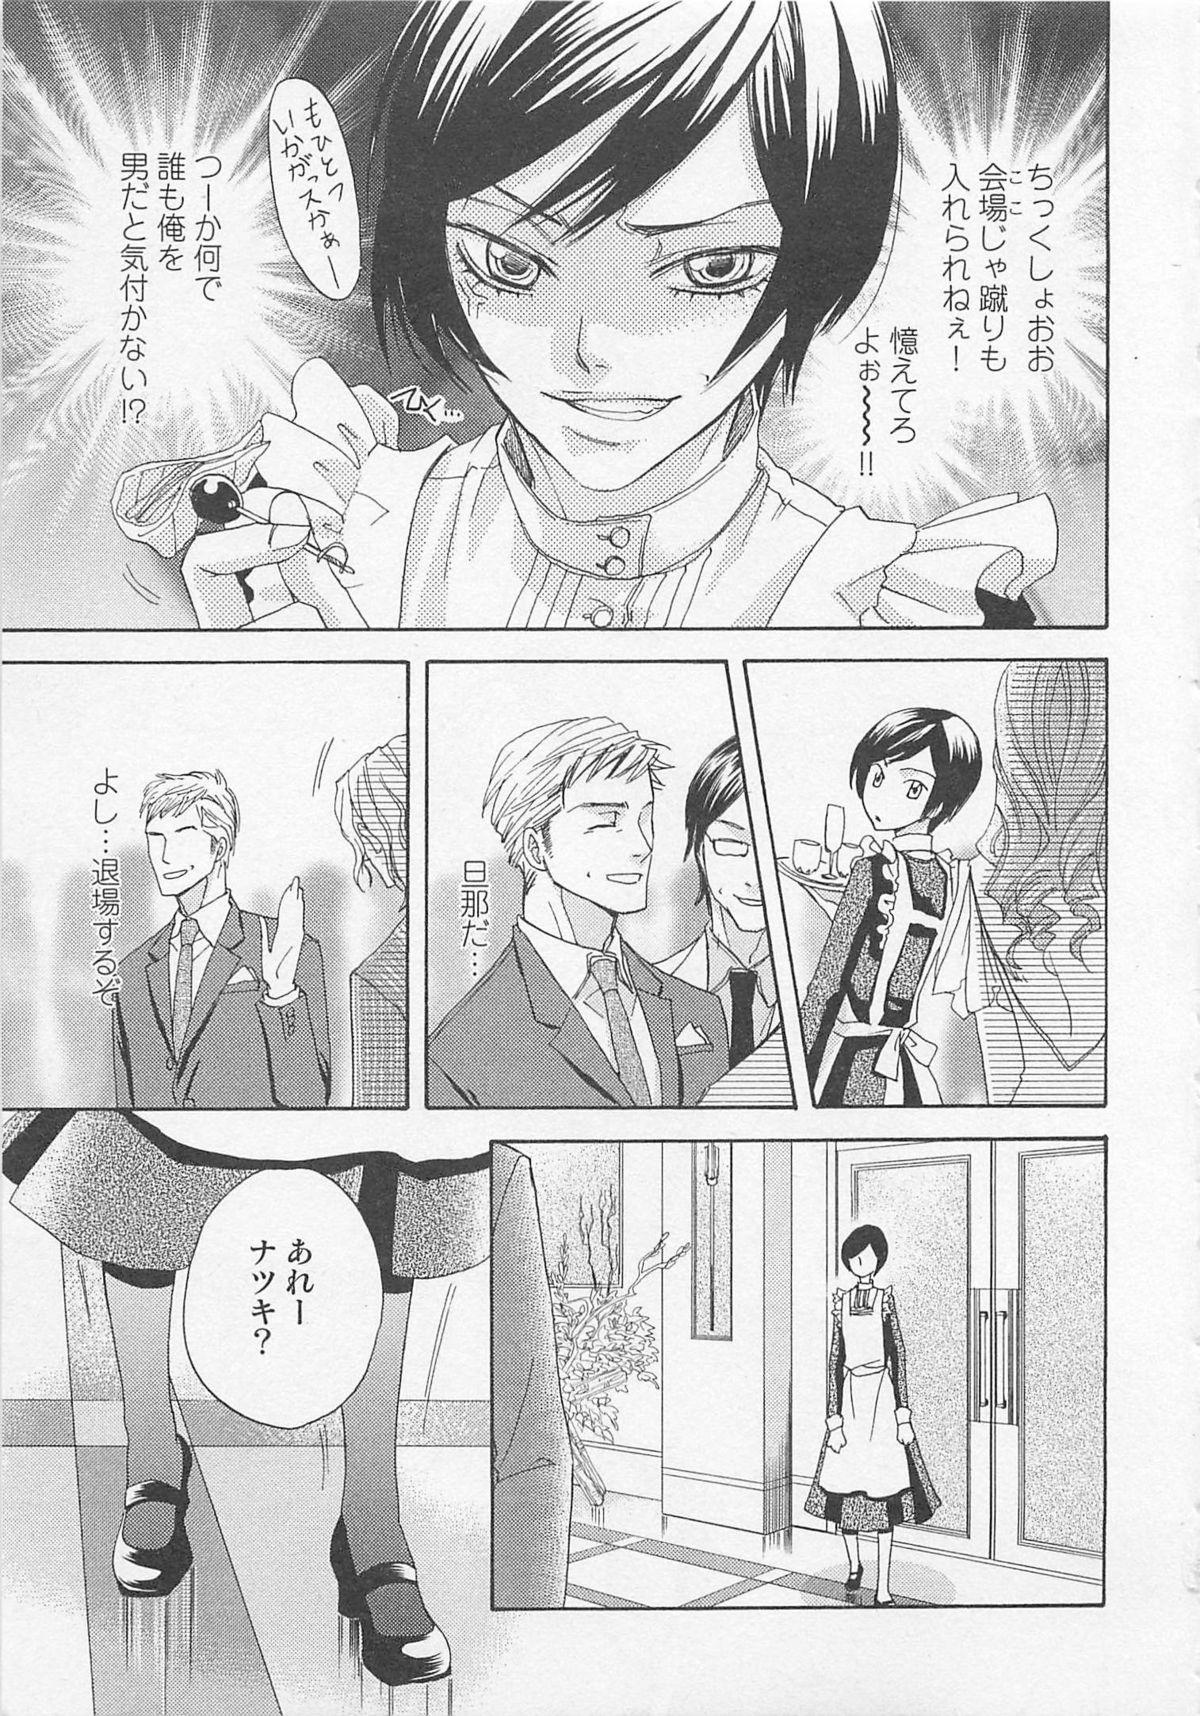 Shounentachi Vol. 2 83